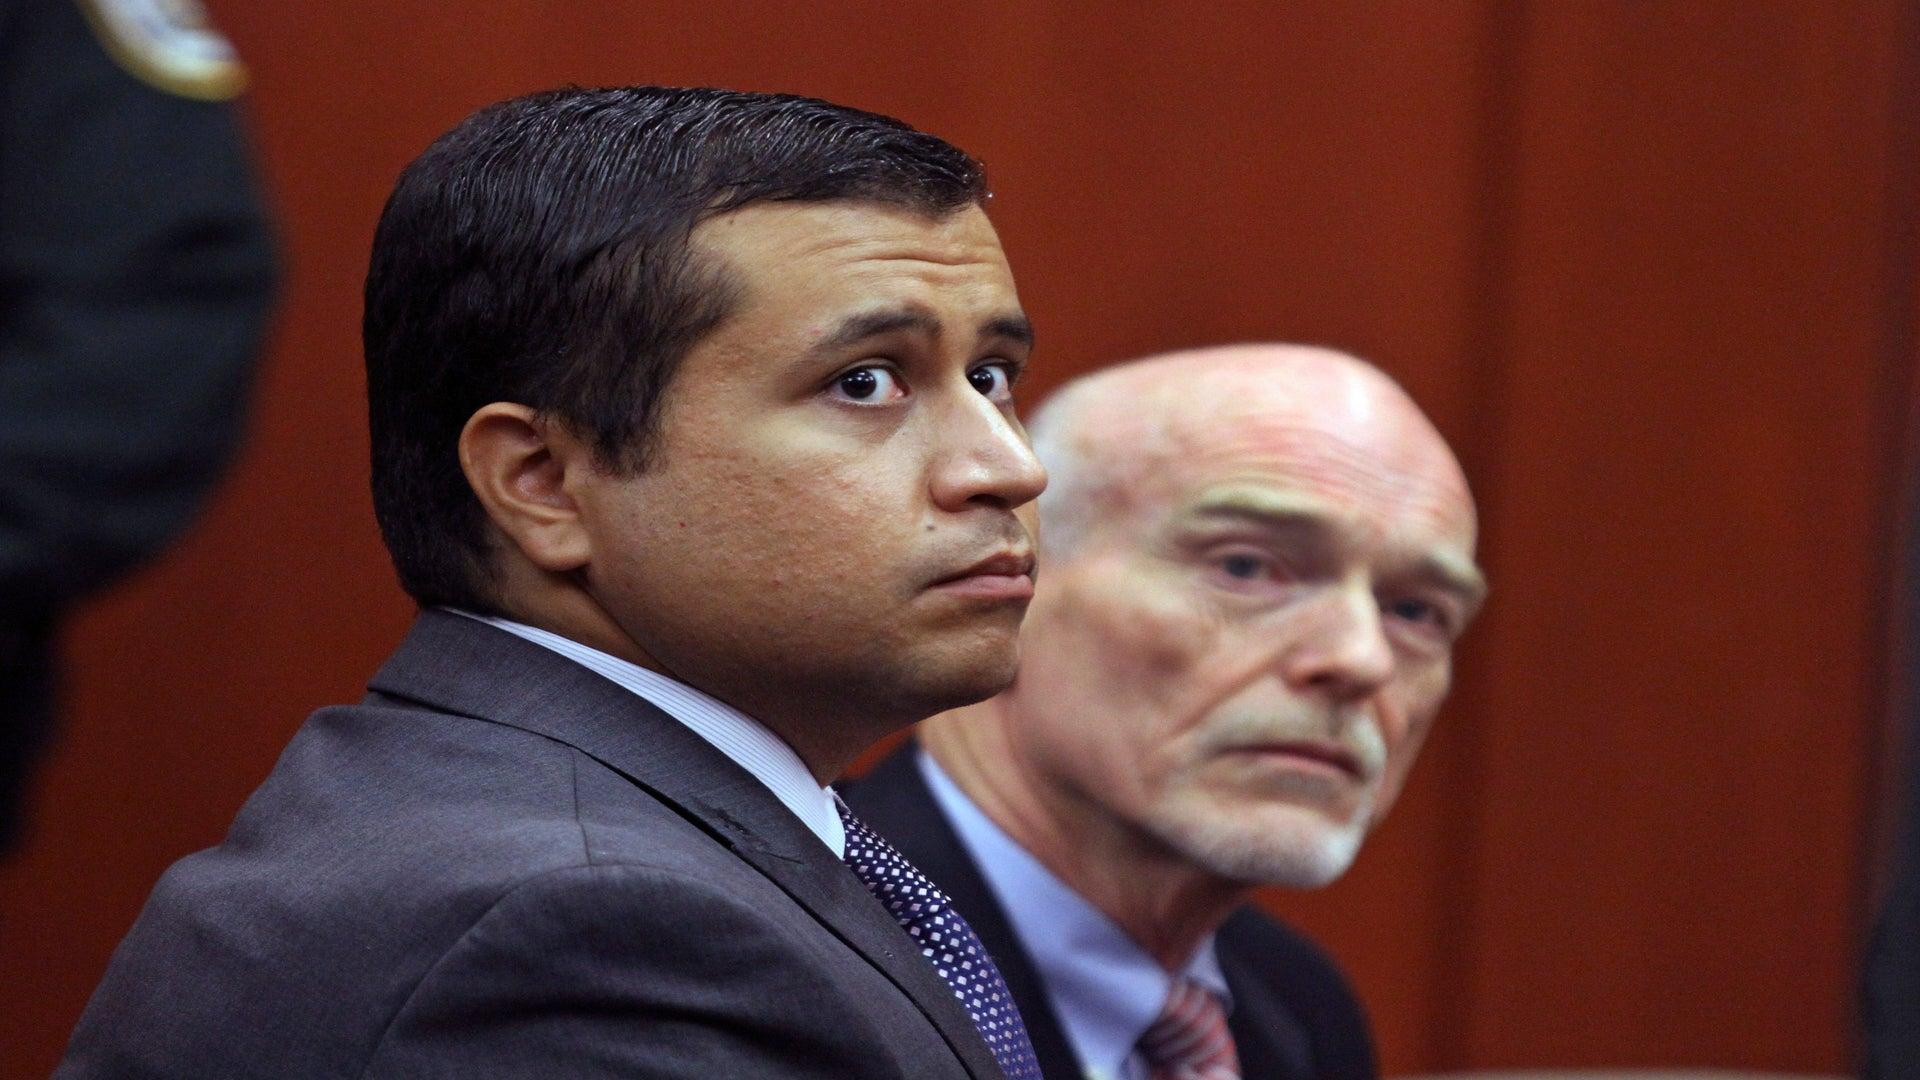 George Zimmerman Apologizes to Trayvon Martin's Family, Says 'It Was God's Plan'